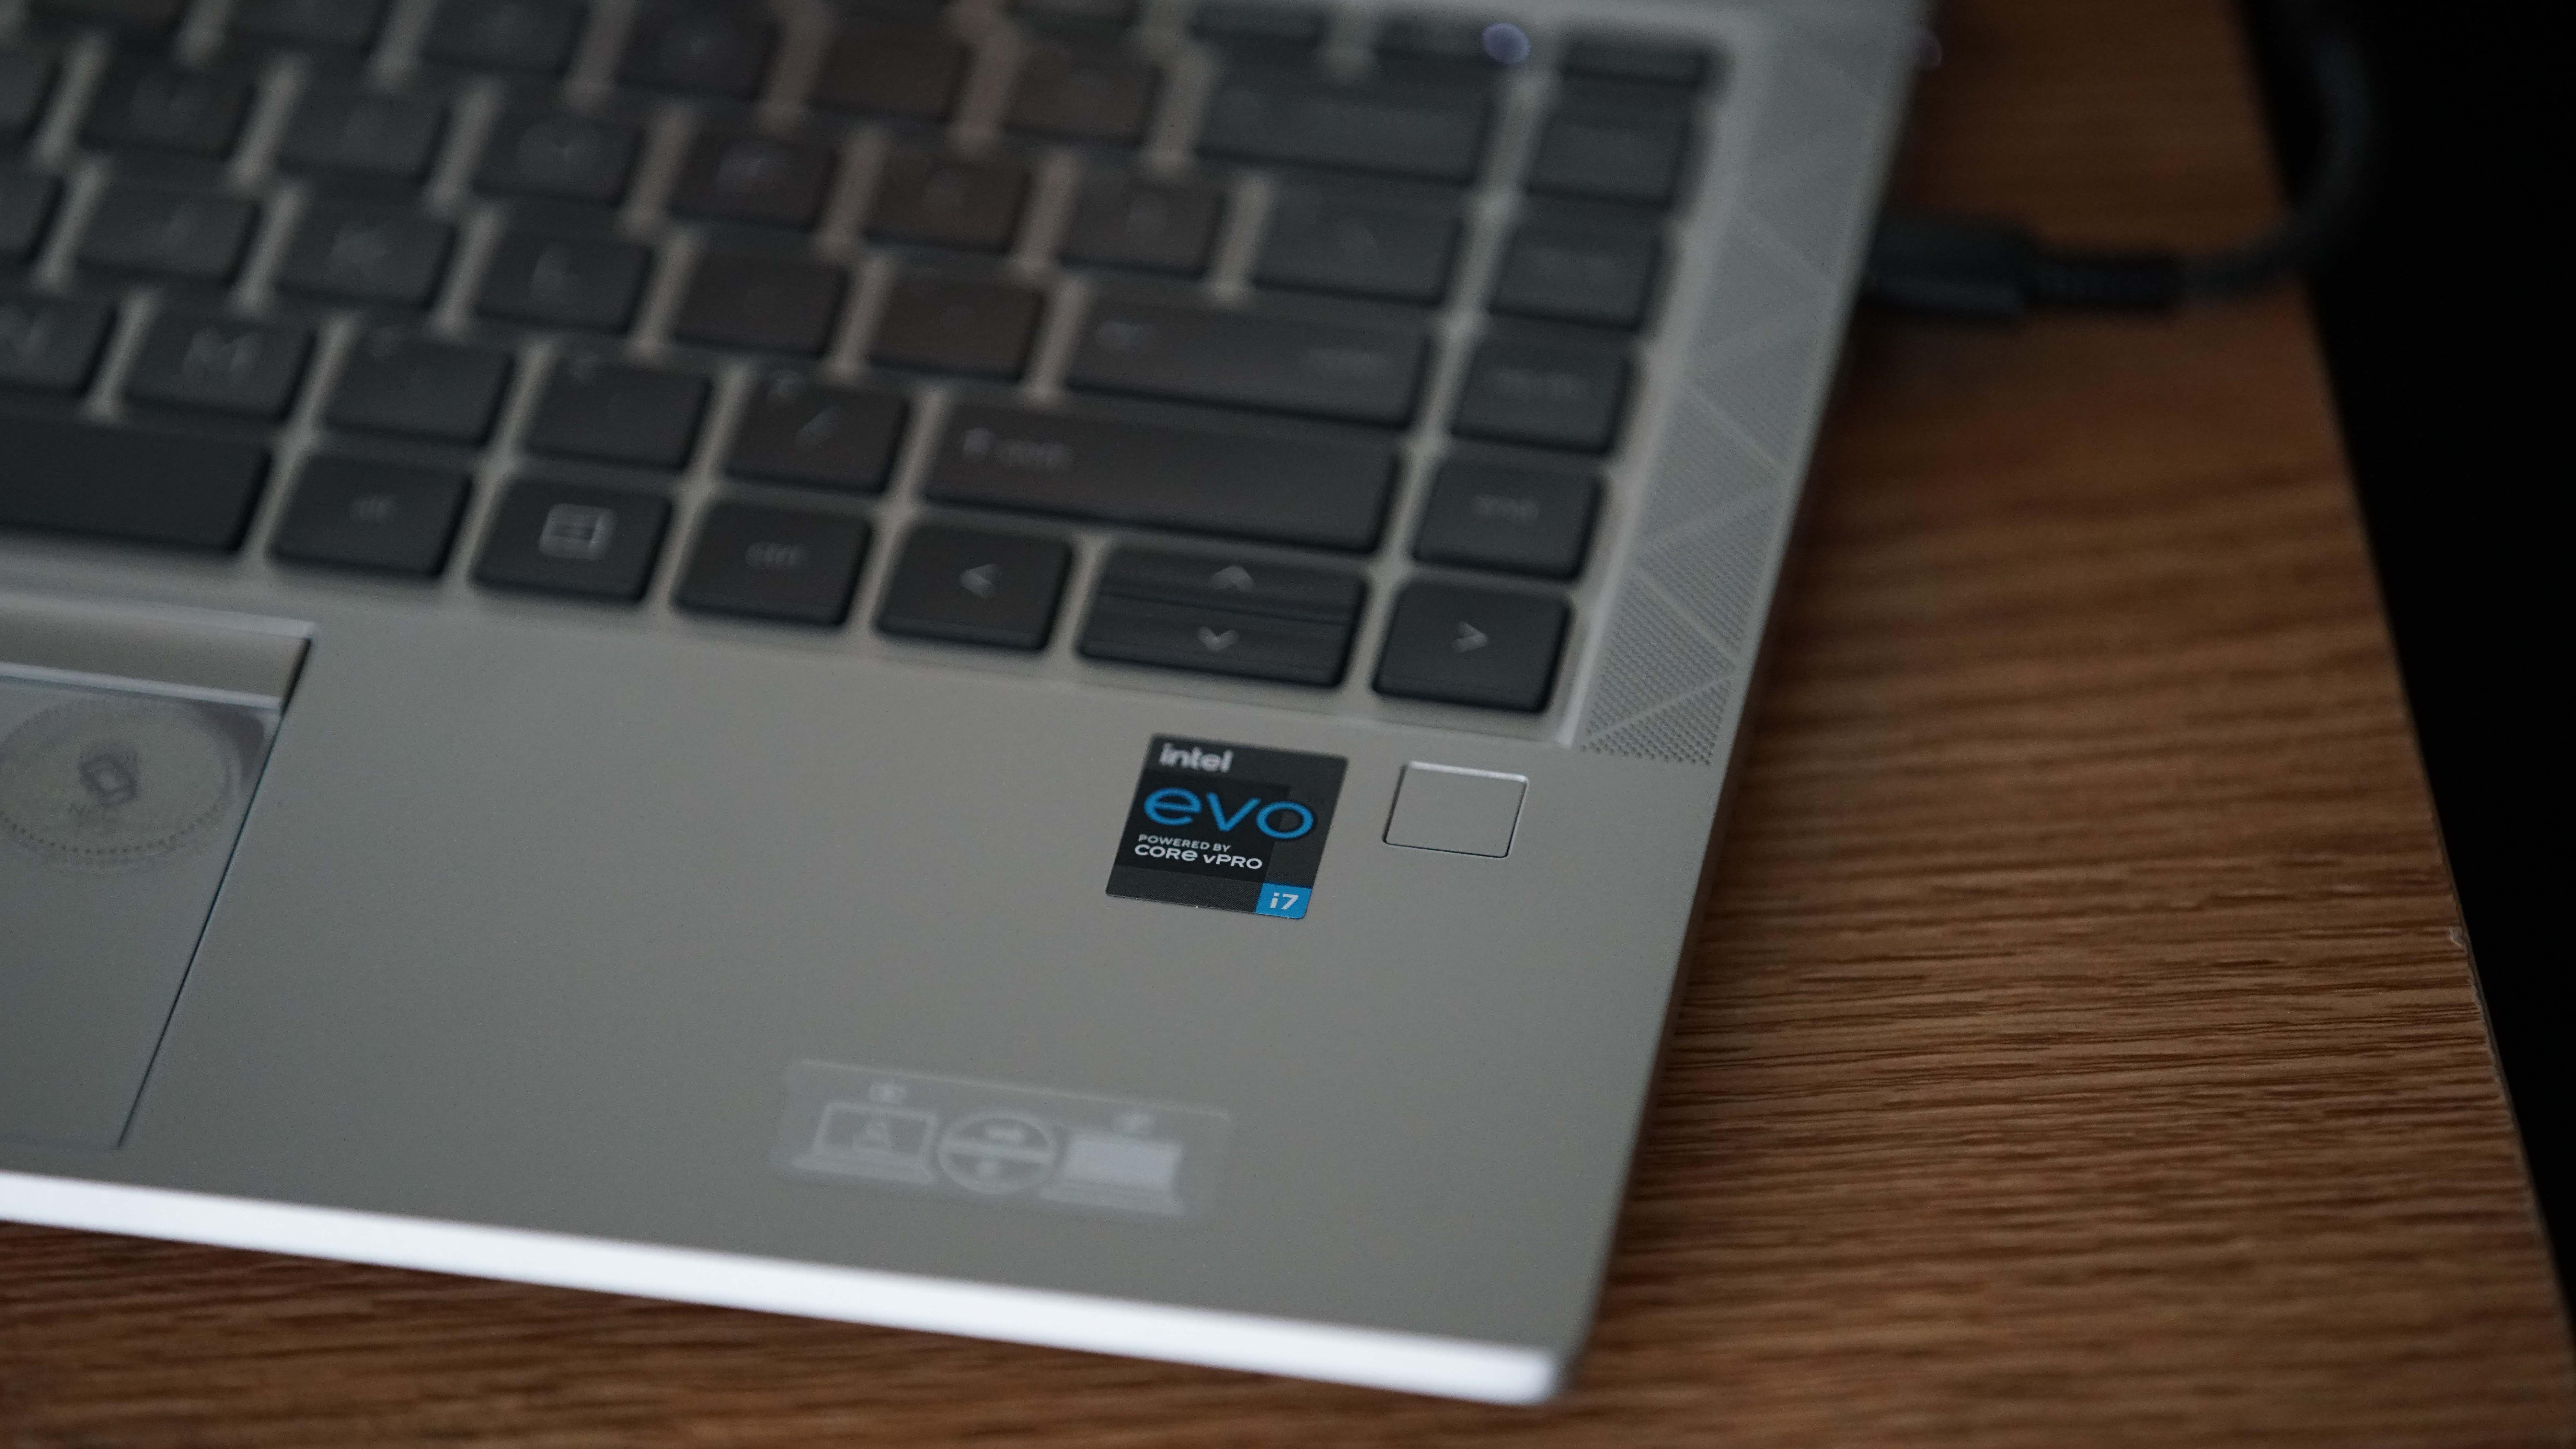 HP EliteBook 840 Aero G8 on a wooden surface